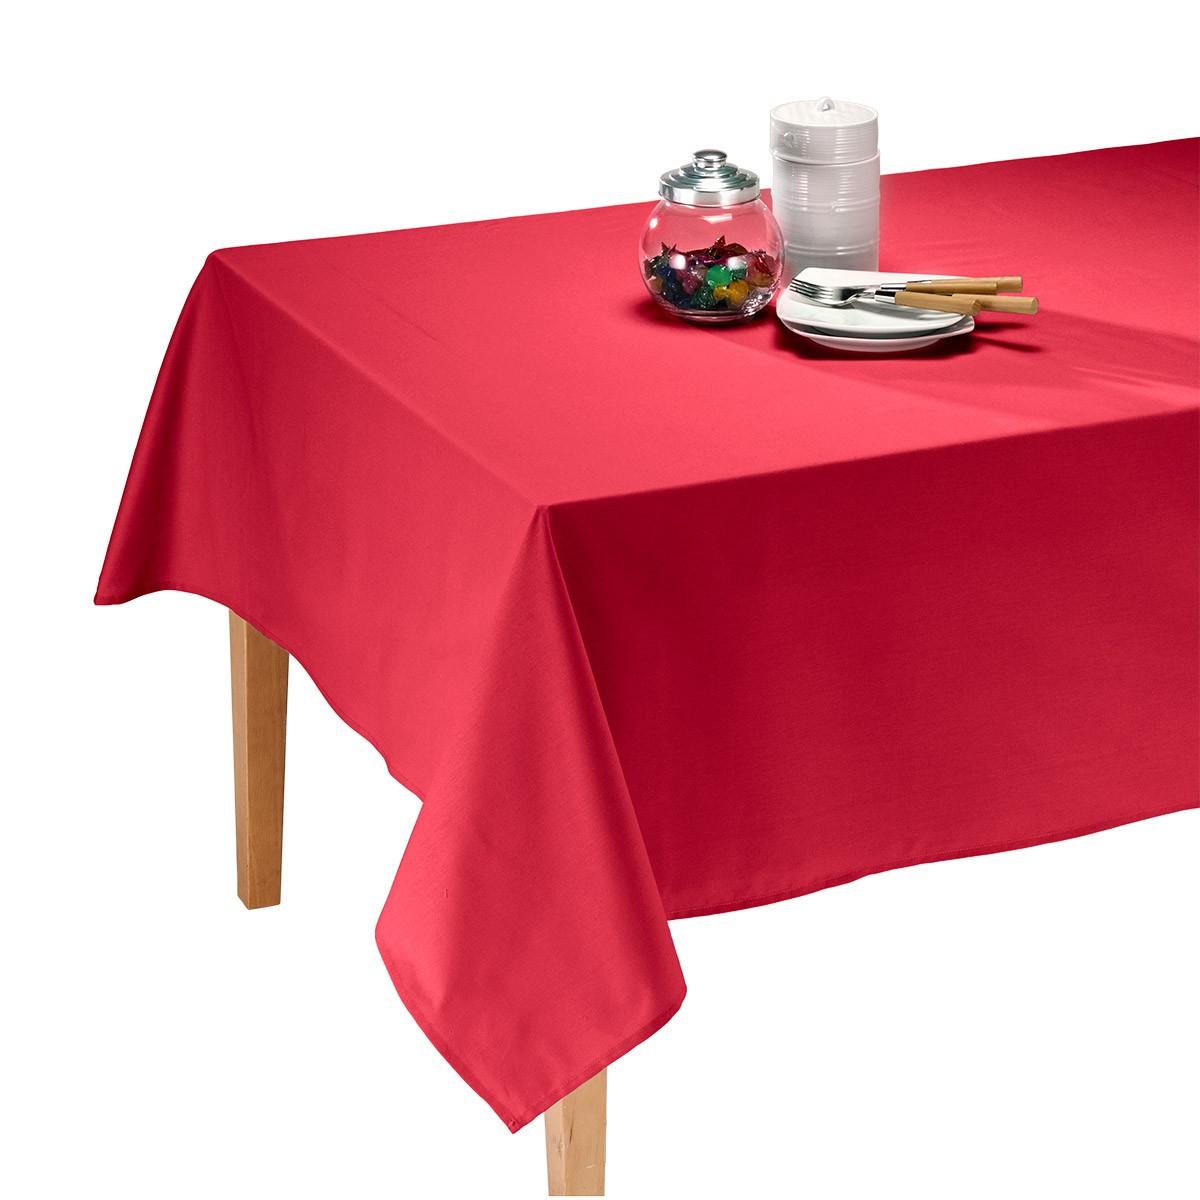 nappe table jardin tendance accueil design et mobilier. Black Bedroom Furniture Sets. Home Design Ideas